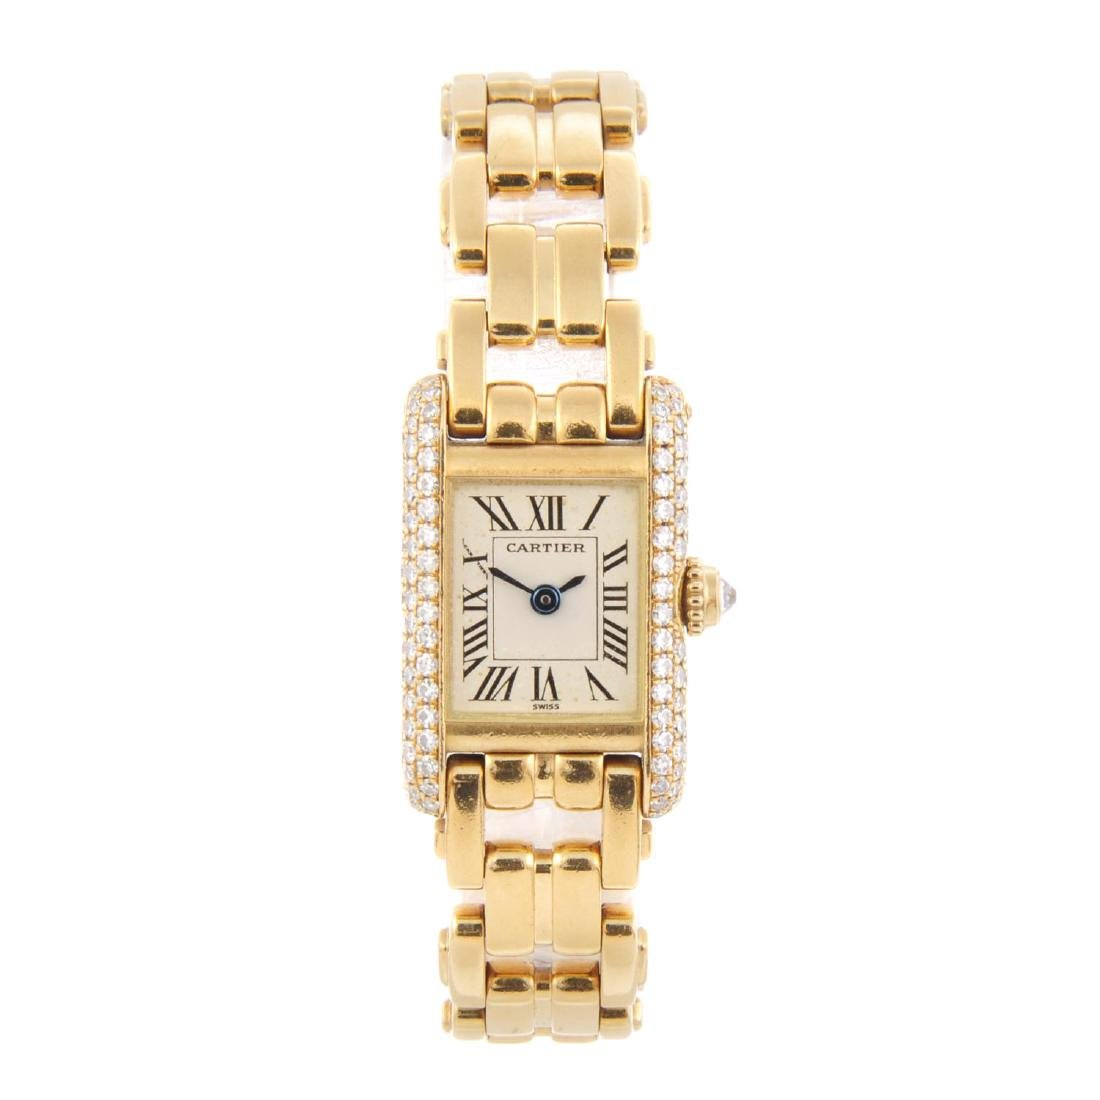 CARTIER - a Mini Tank bracelet watch. 18ct yellow gold